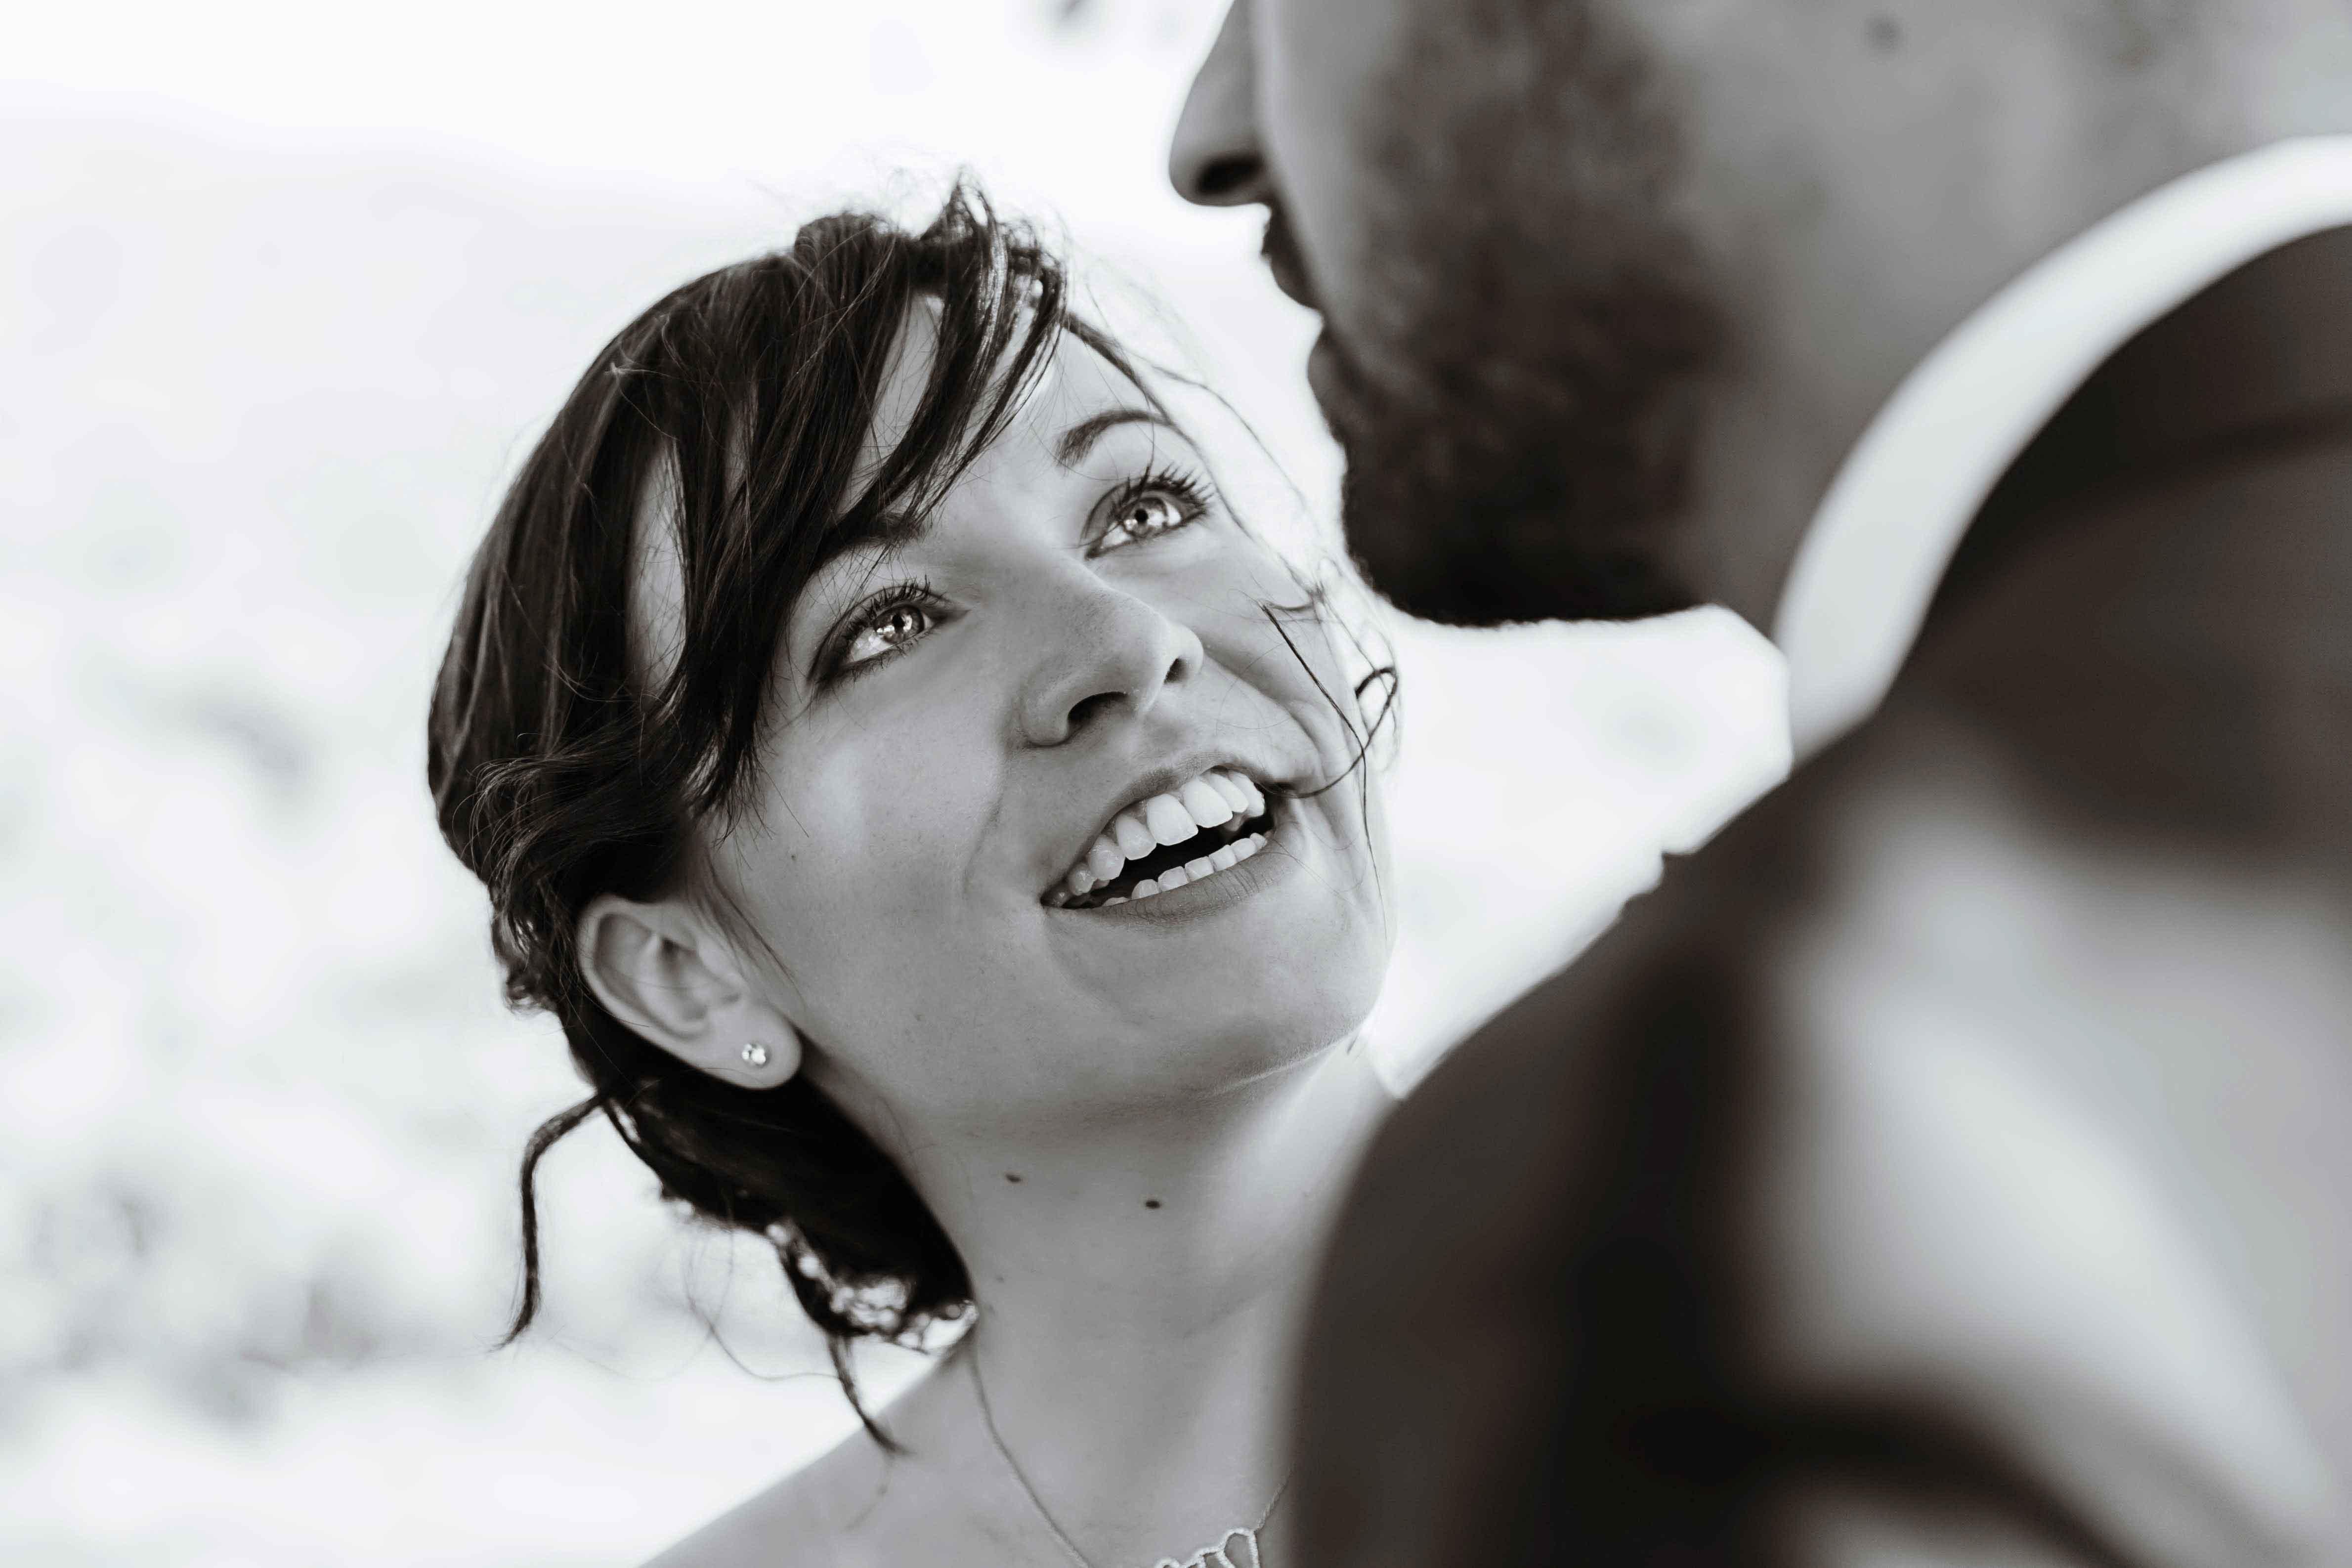 photographe beaujolais lyon photographie couple amour